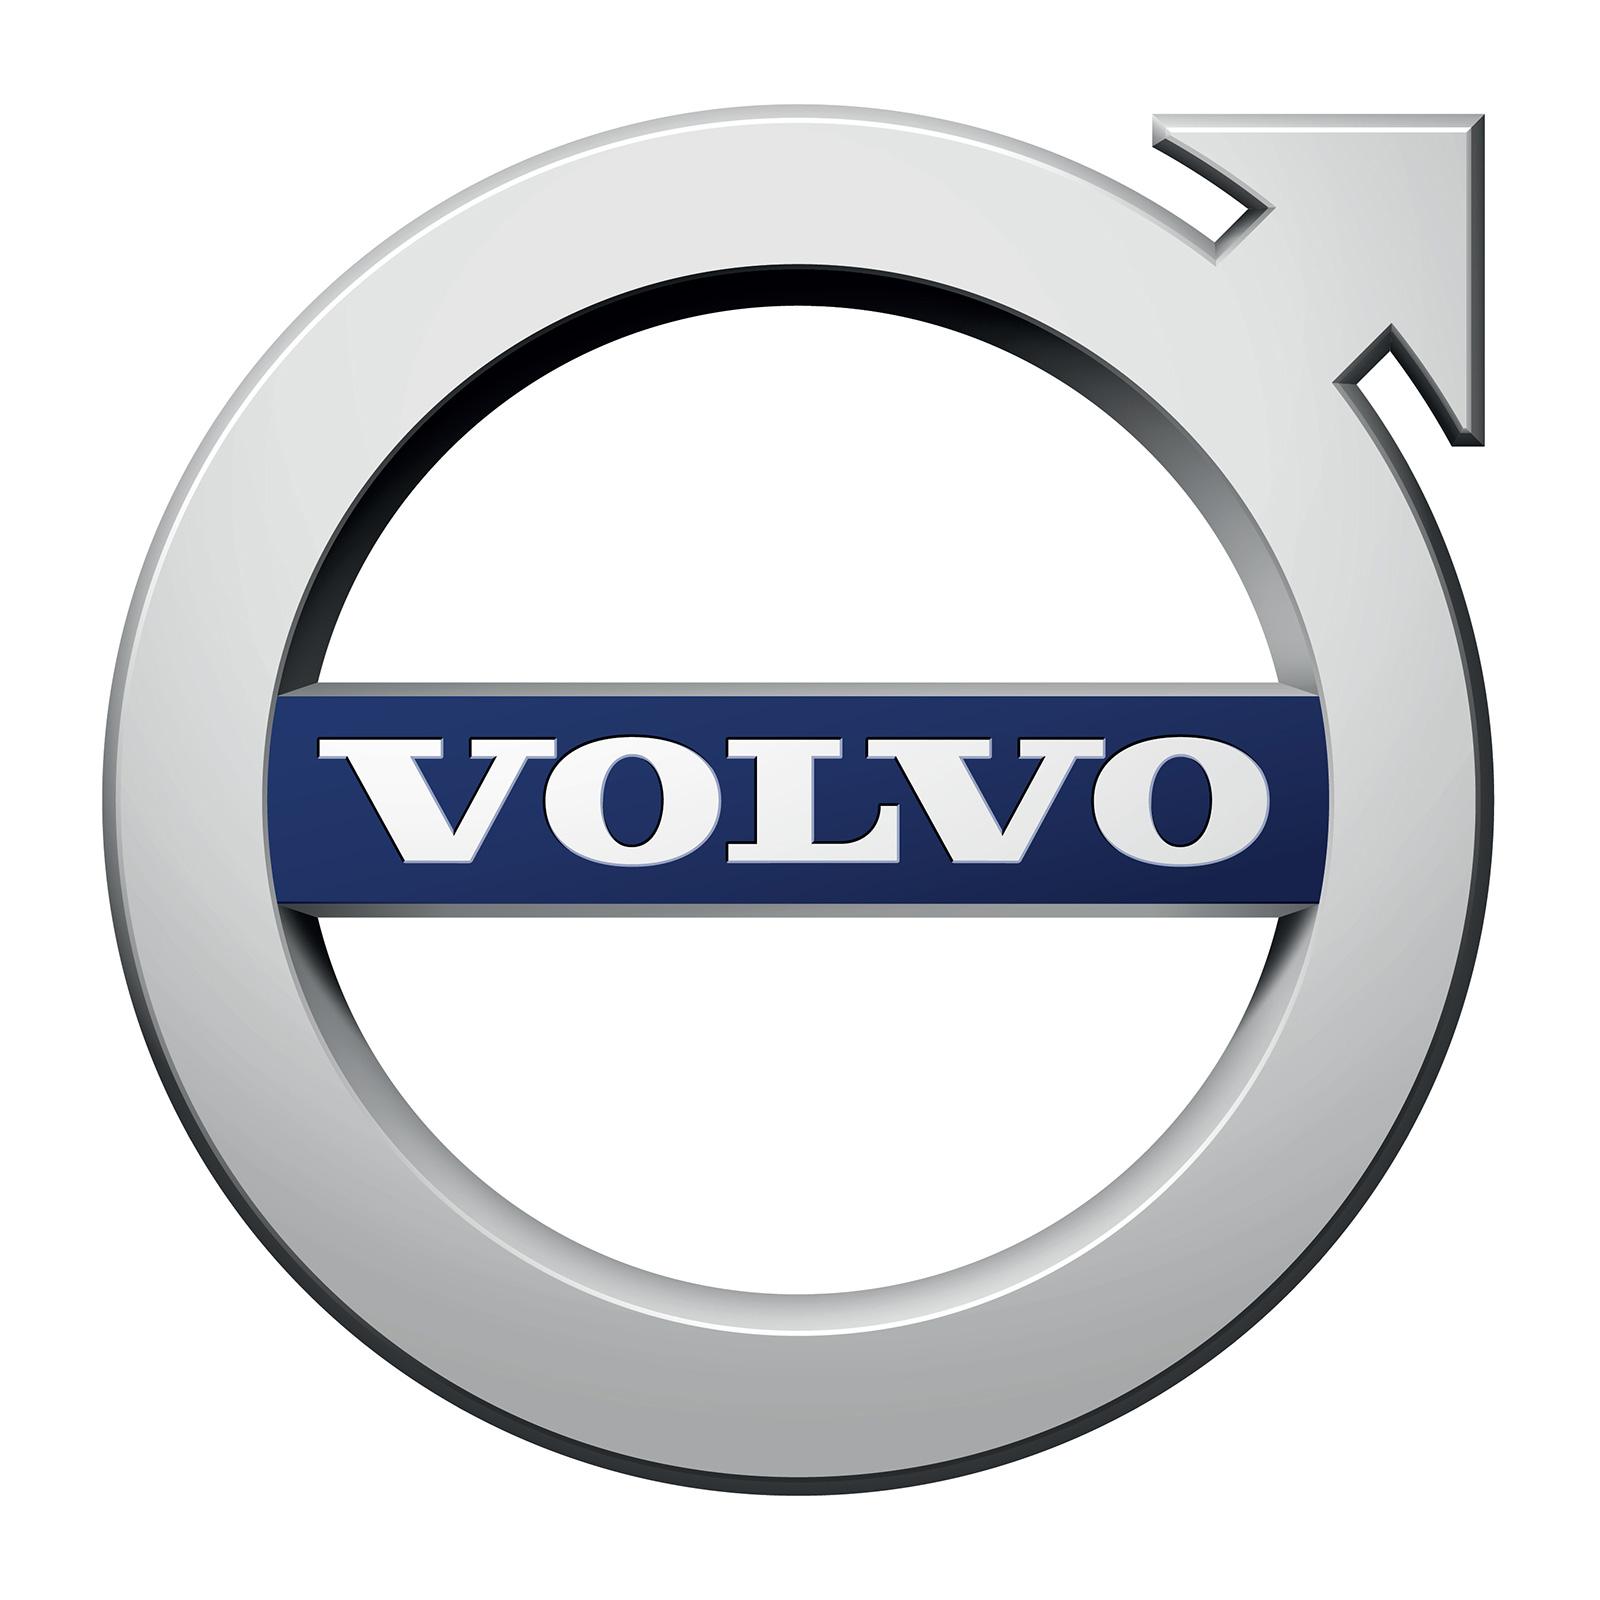 Volvo logo iron symbol